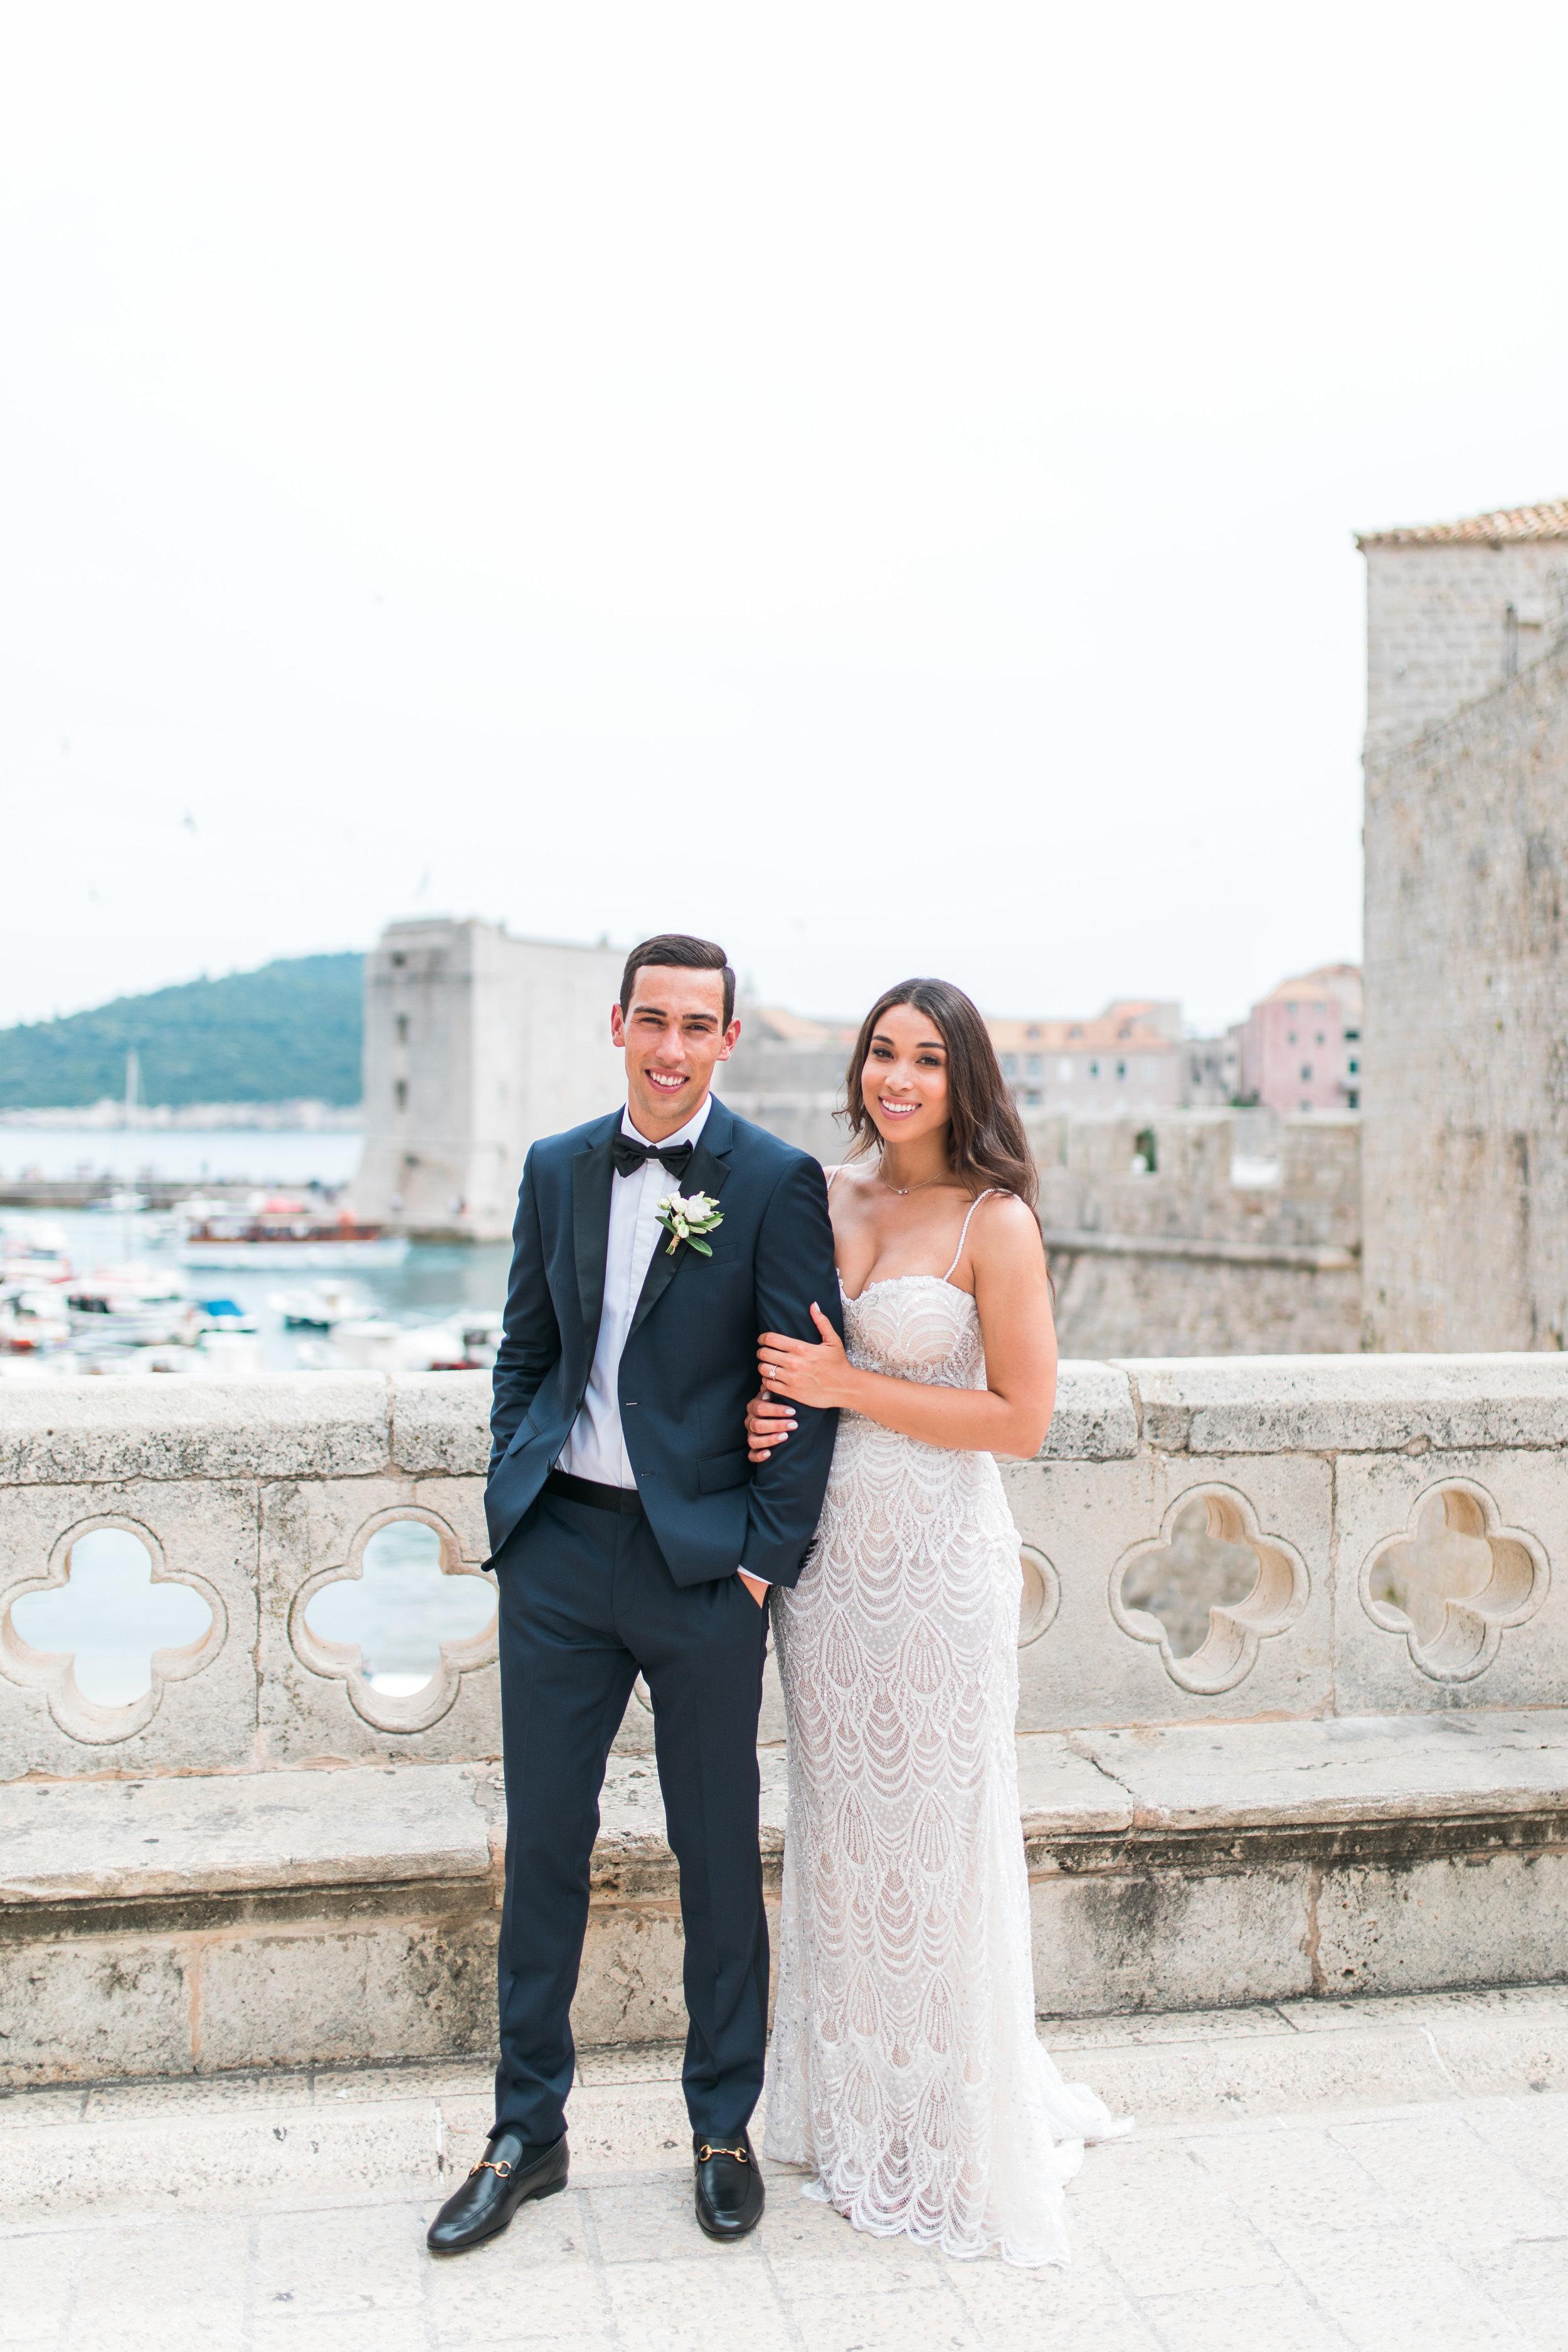 Dubrovnik-Wedding-Photographer-Croatia-Wedding-Photos-JBJ-Pictures-15.jpg